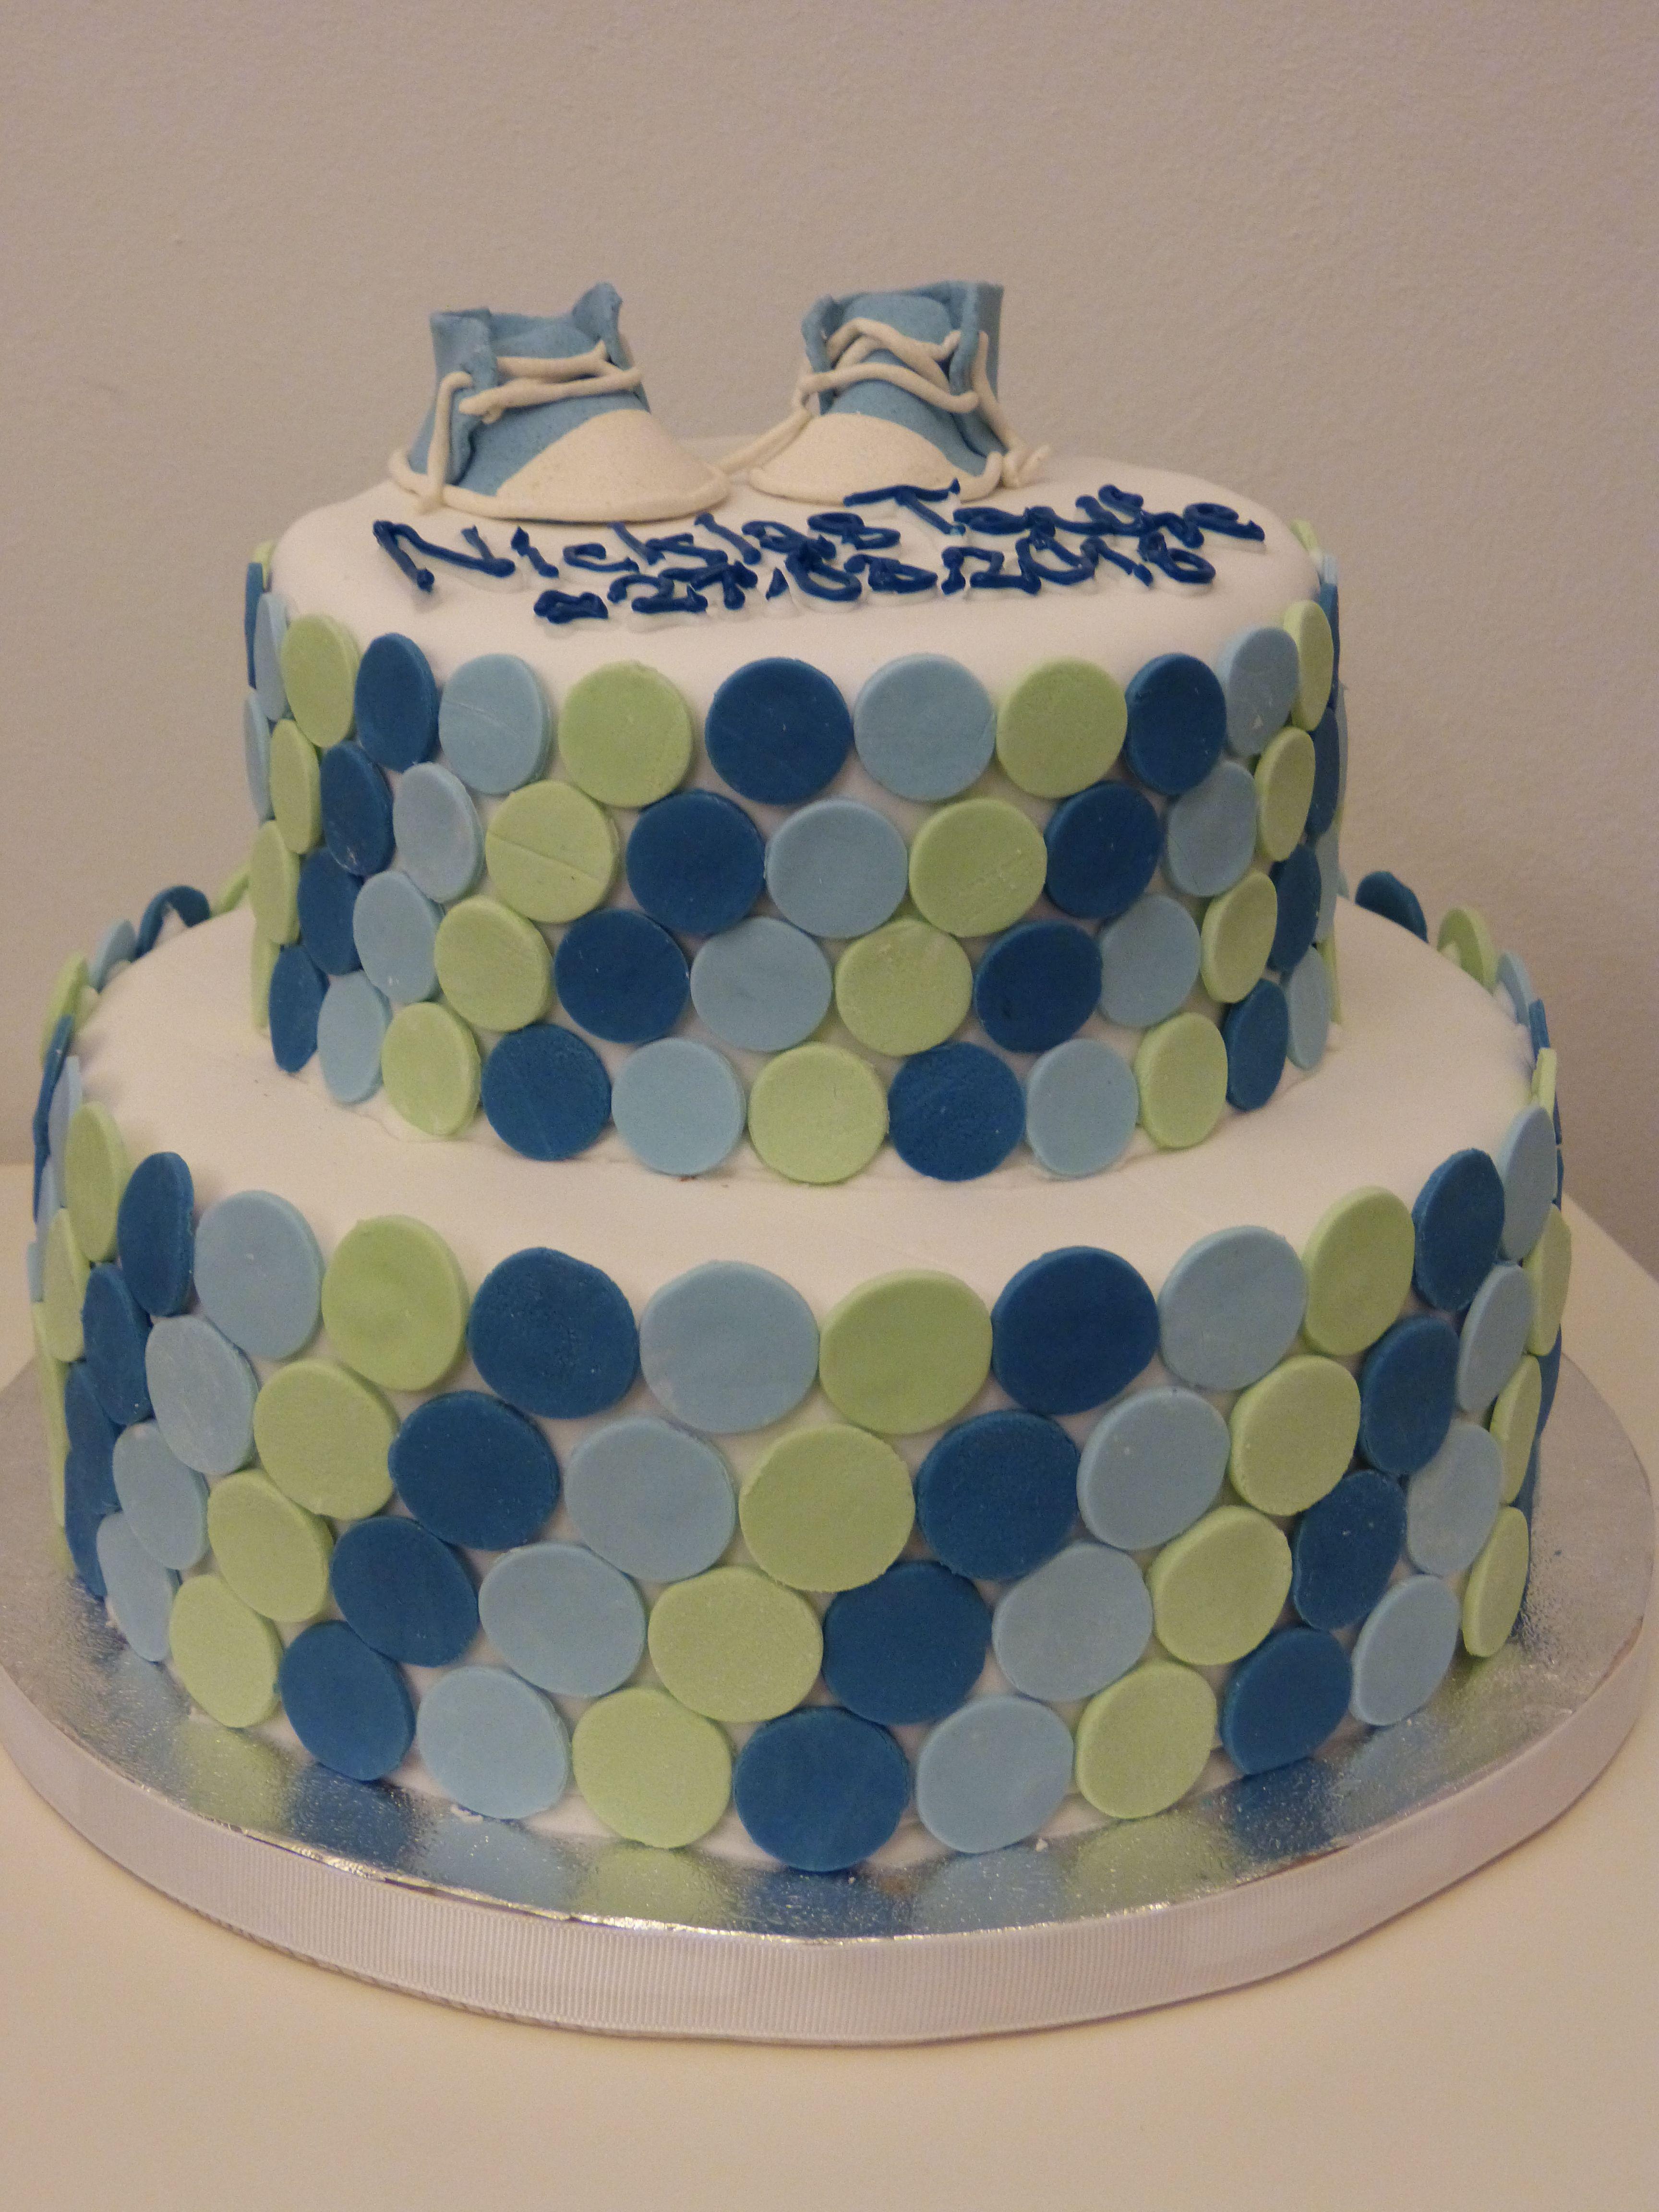 Cupcakes Christening Cake Taufkuchen Tauftorte boy Cake Tauftorte Junge Cake Cube Konz